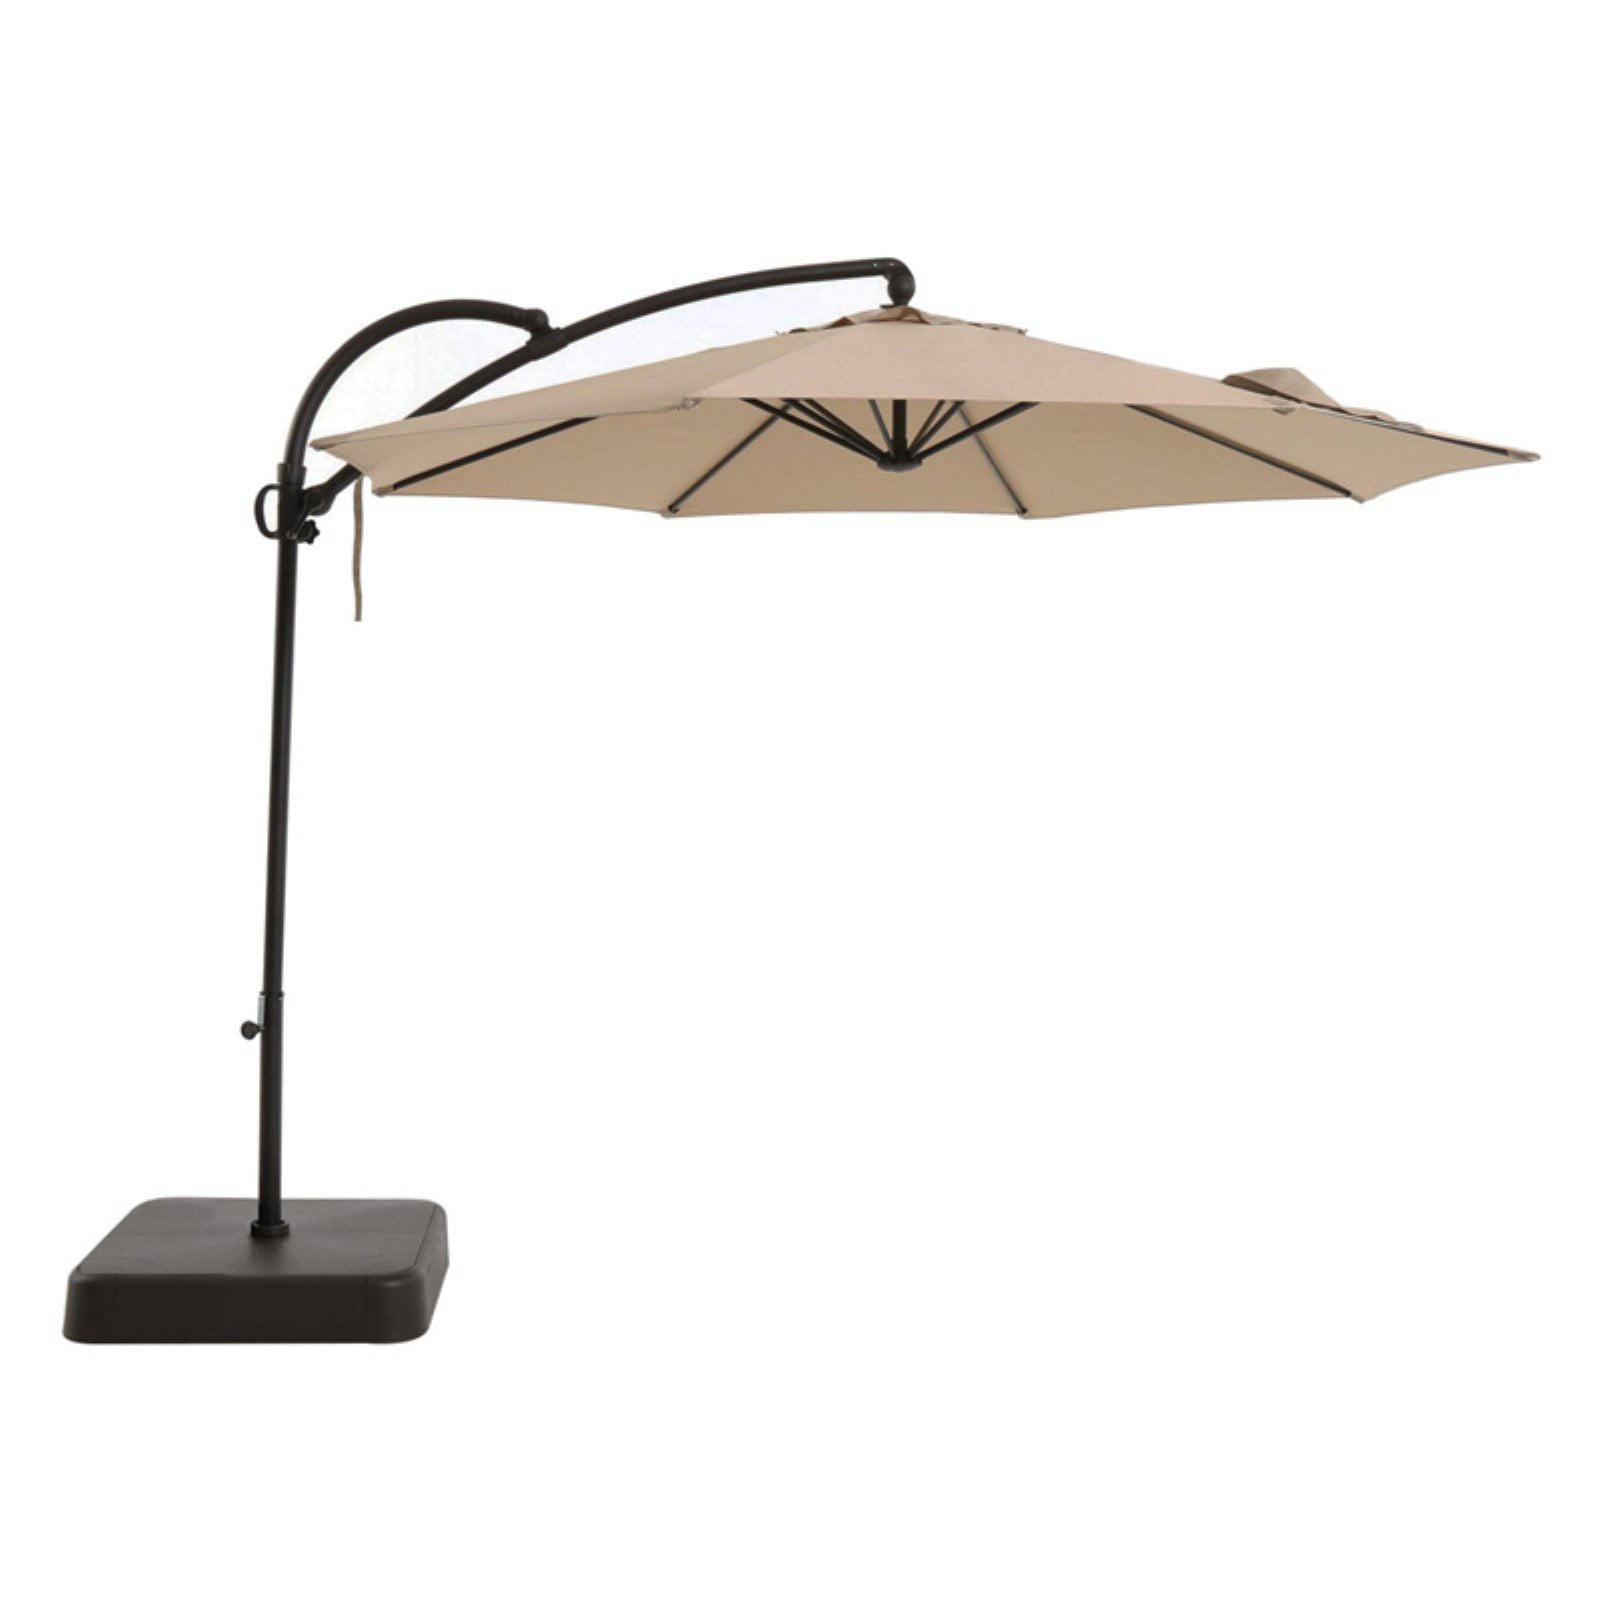 royal garden 10 ft. aluminum offset patio umbrella with sand Base for 10 Ft Umbrella